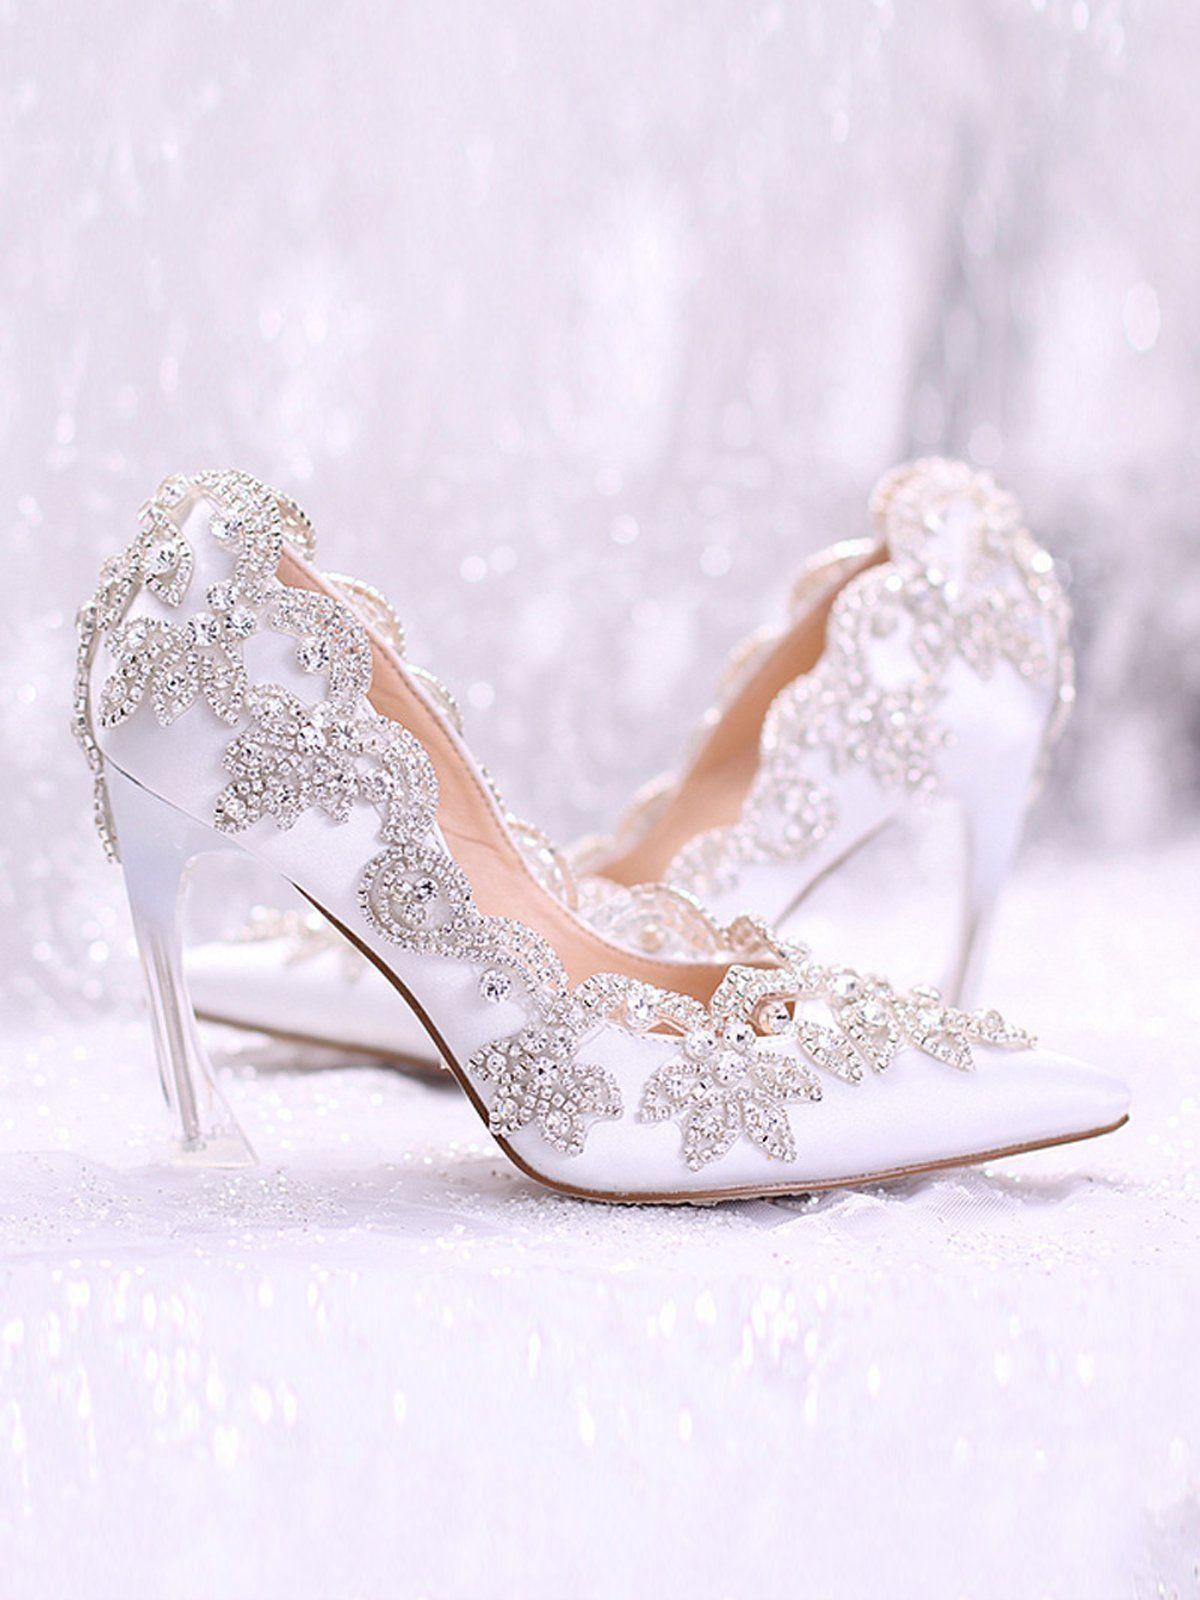 Ultra-high Heel Wedding Shoes in 2020